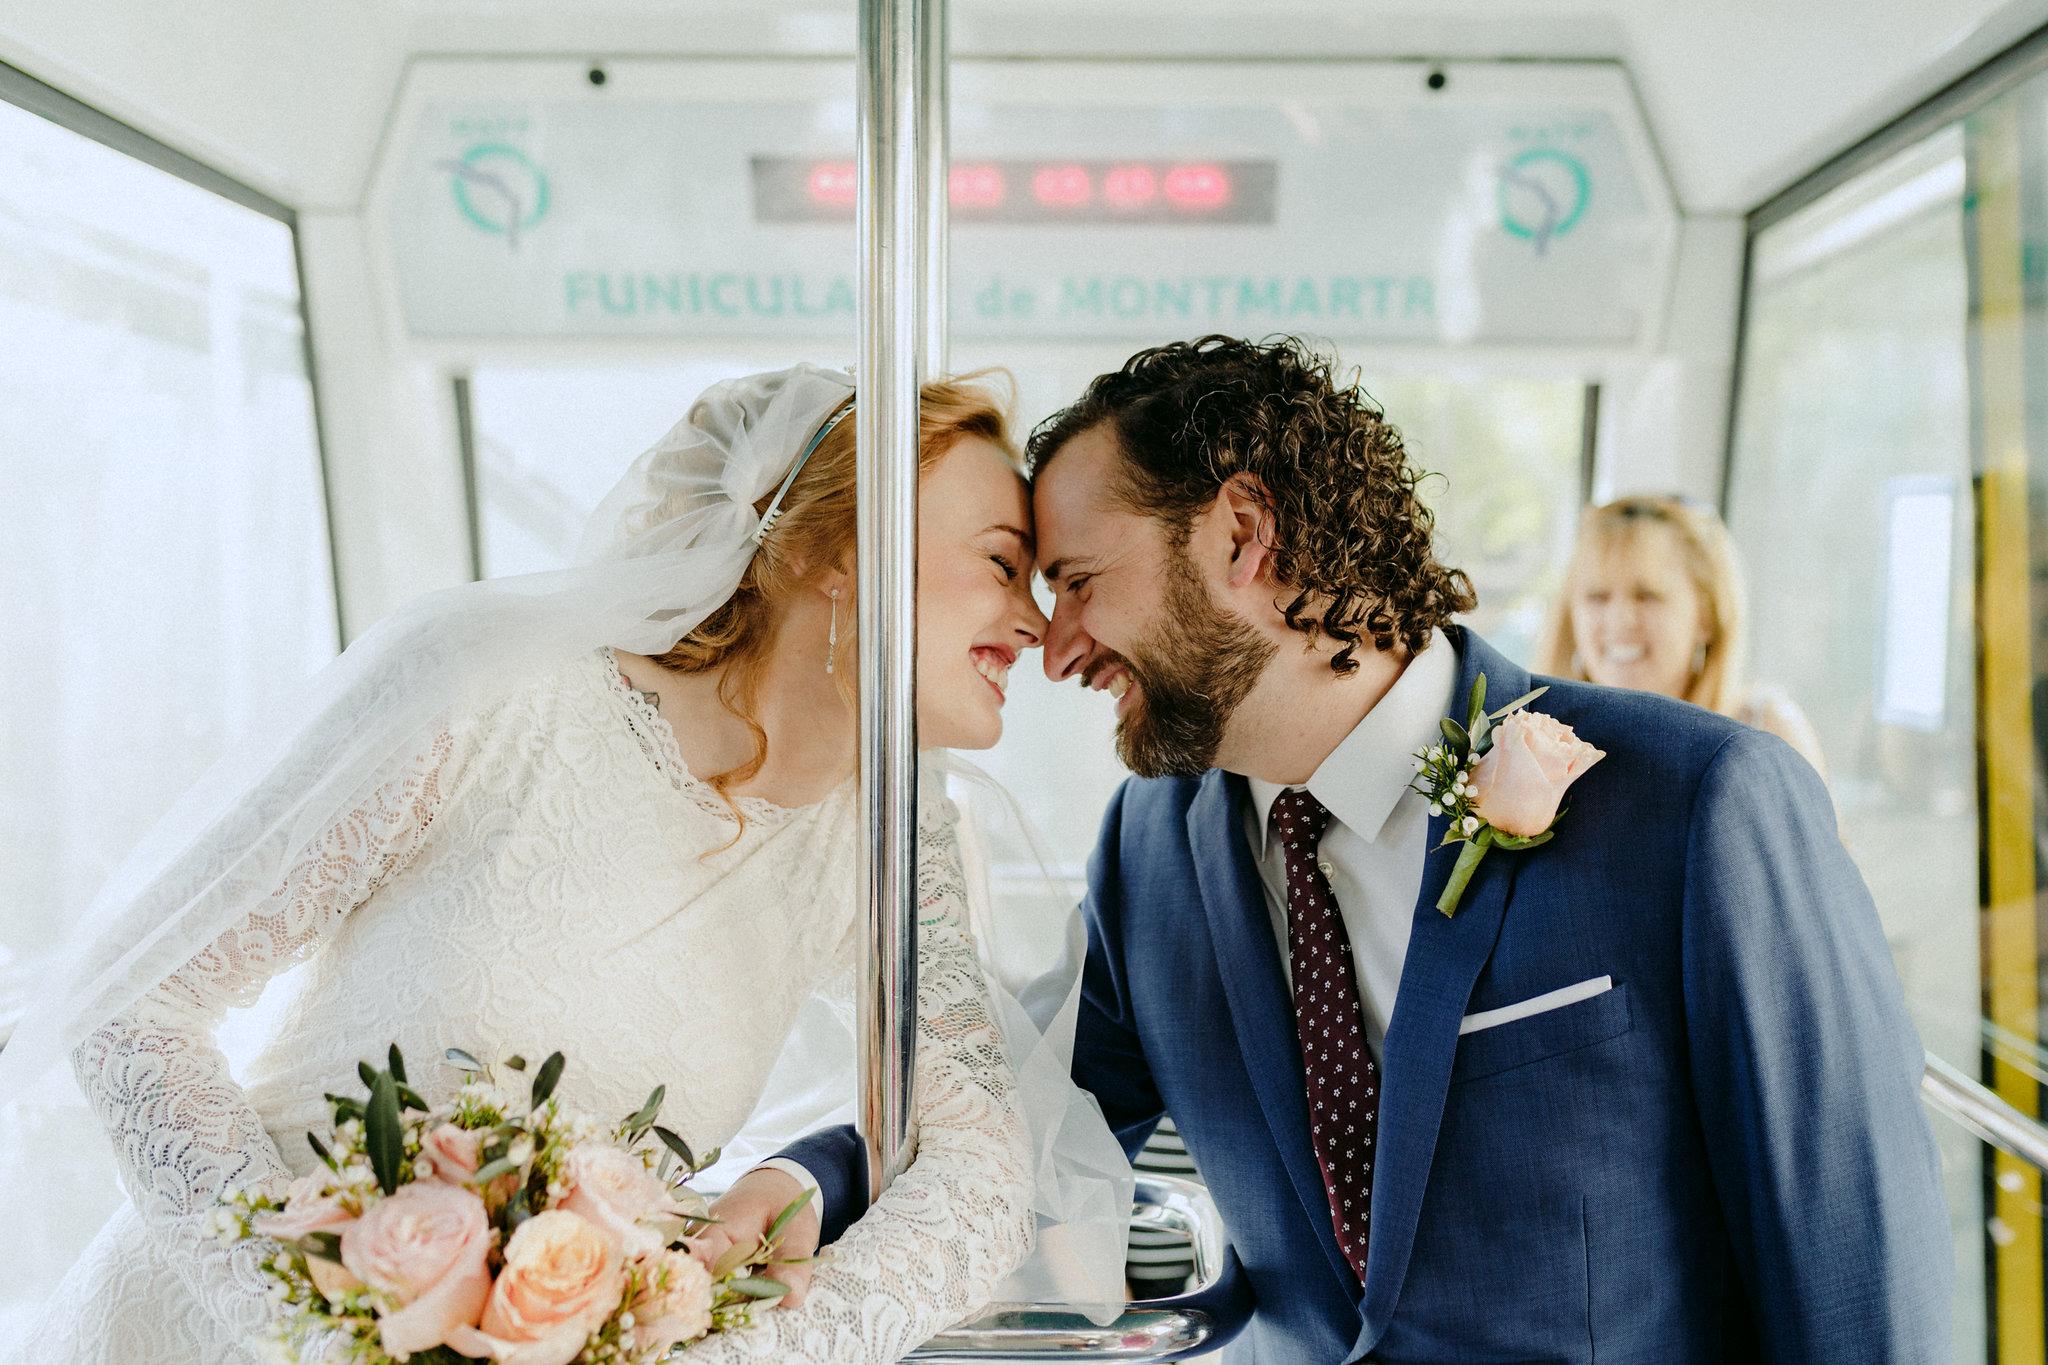 Paris_elopement_wedding_photographer-126.jpg